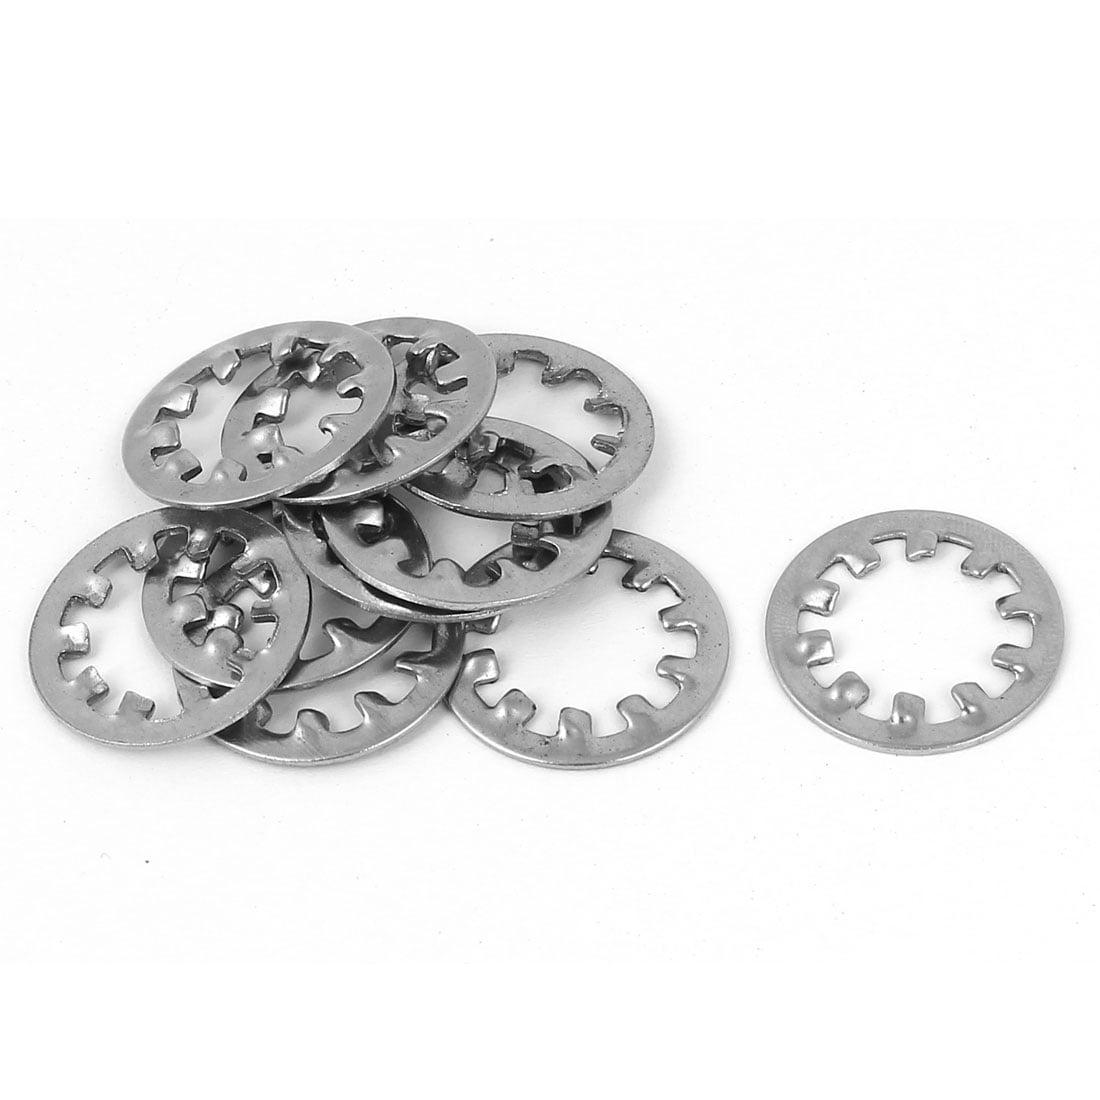 M12 304 Stainless Steel Internal Star Lock Washers 10 Pcs